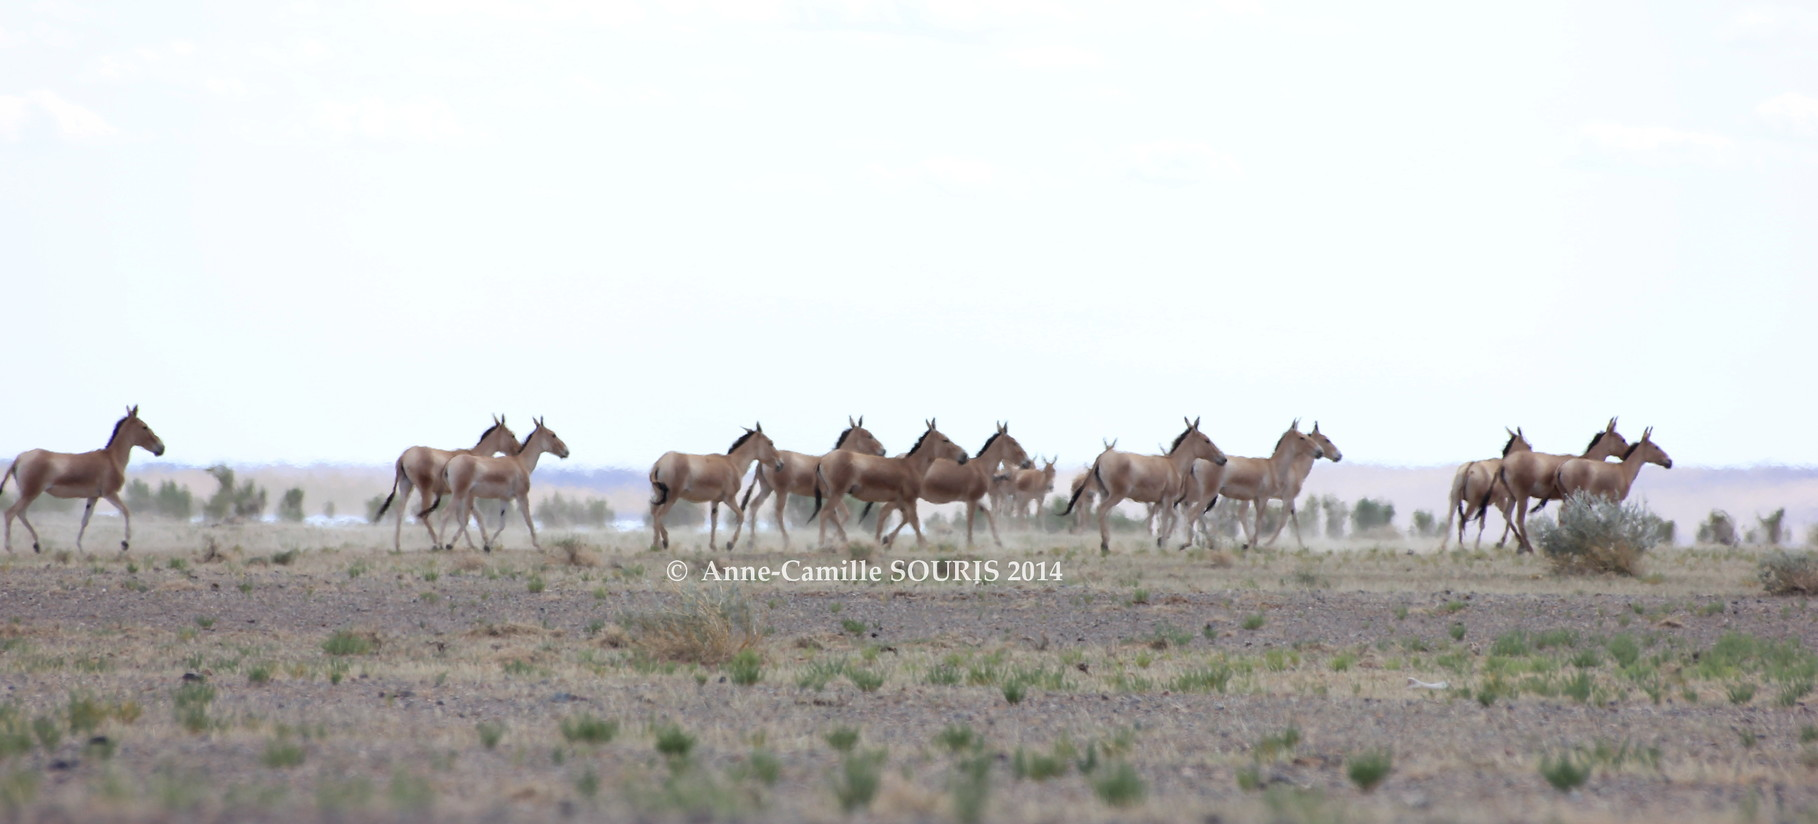 the mongolian khulan - Conservation of the Mongolian wild  hemione-khulan/Conservation de l'hémione-khulan de Mongolie